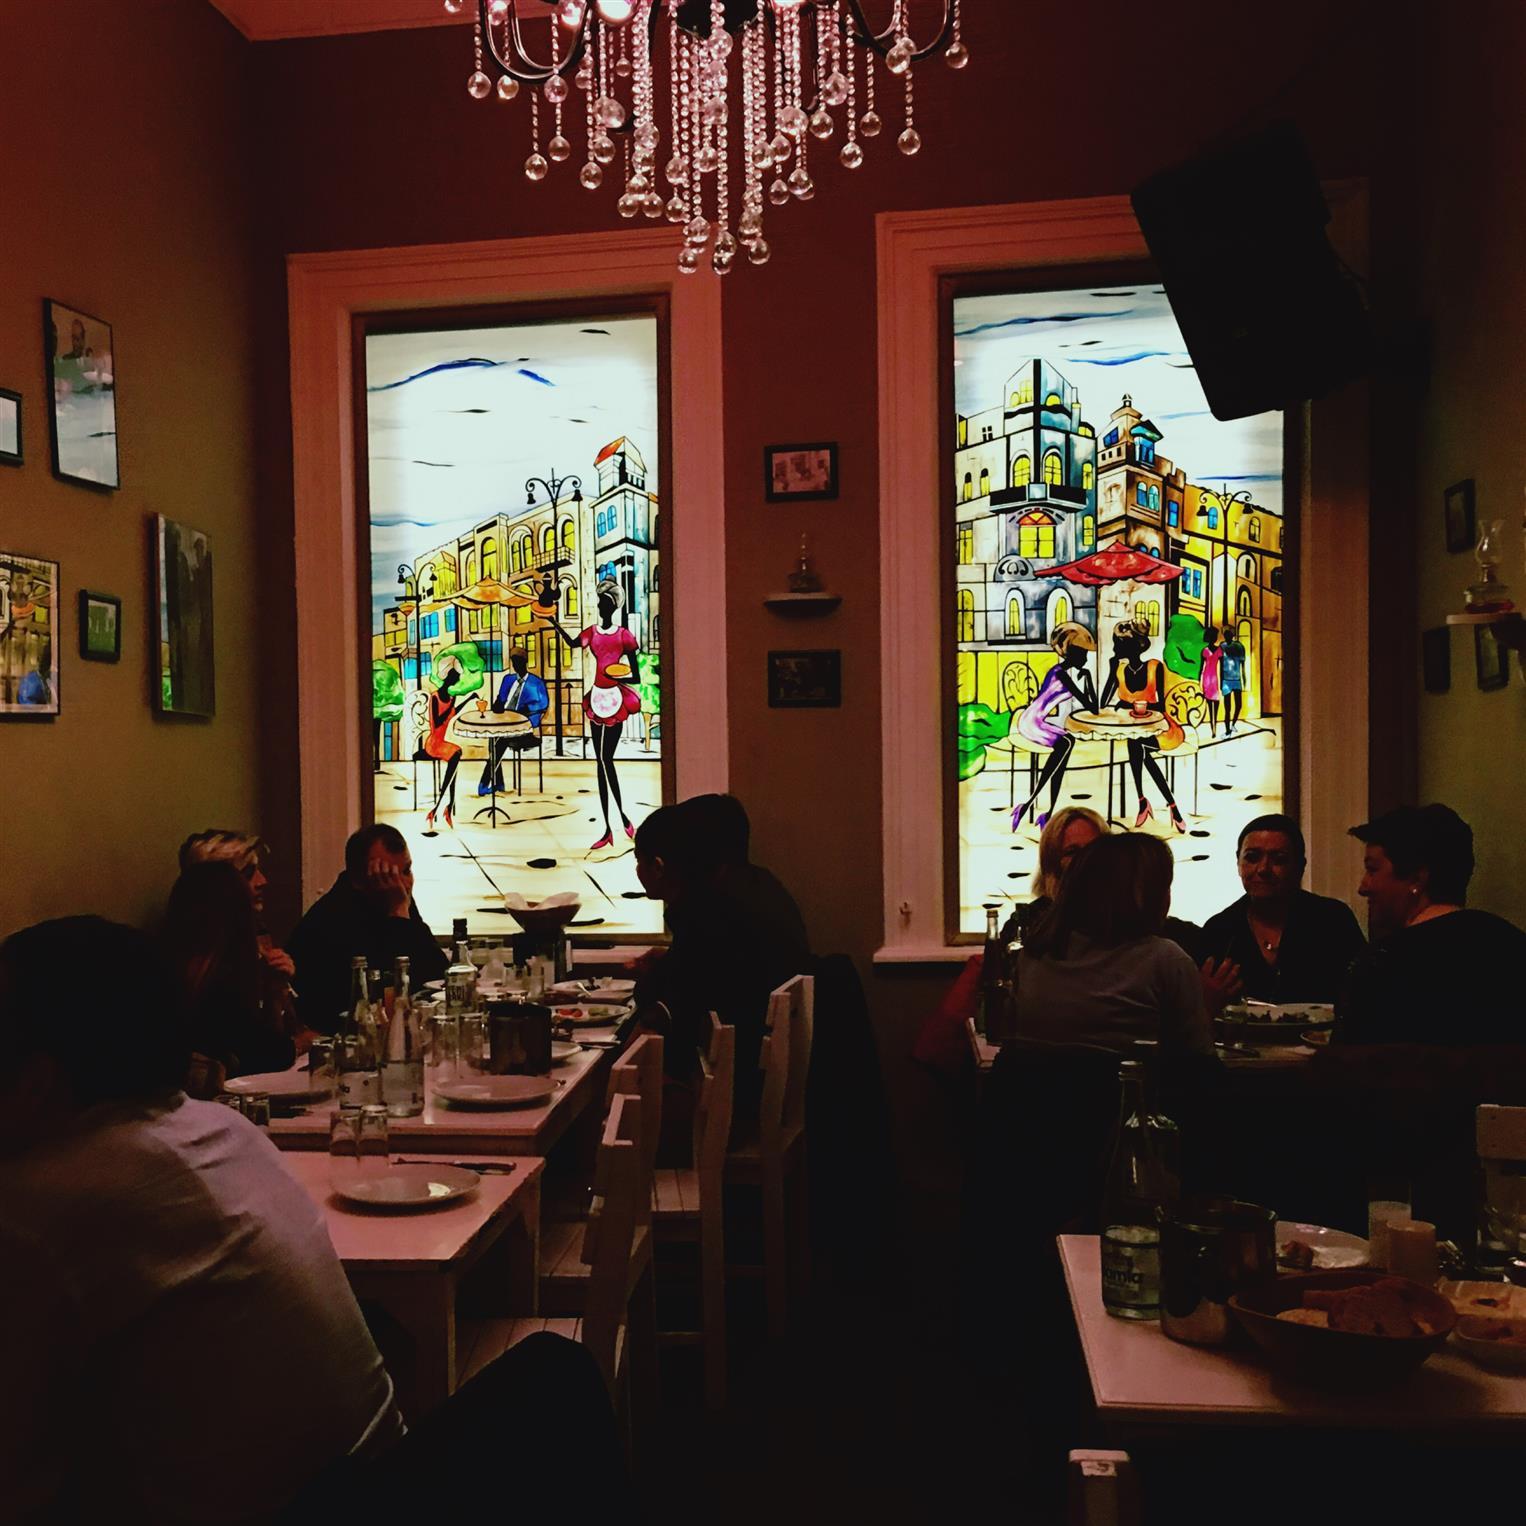 maitia-restoran-guzelyali201652135911325.jpg izmir vitray çalışması